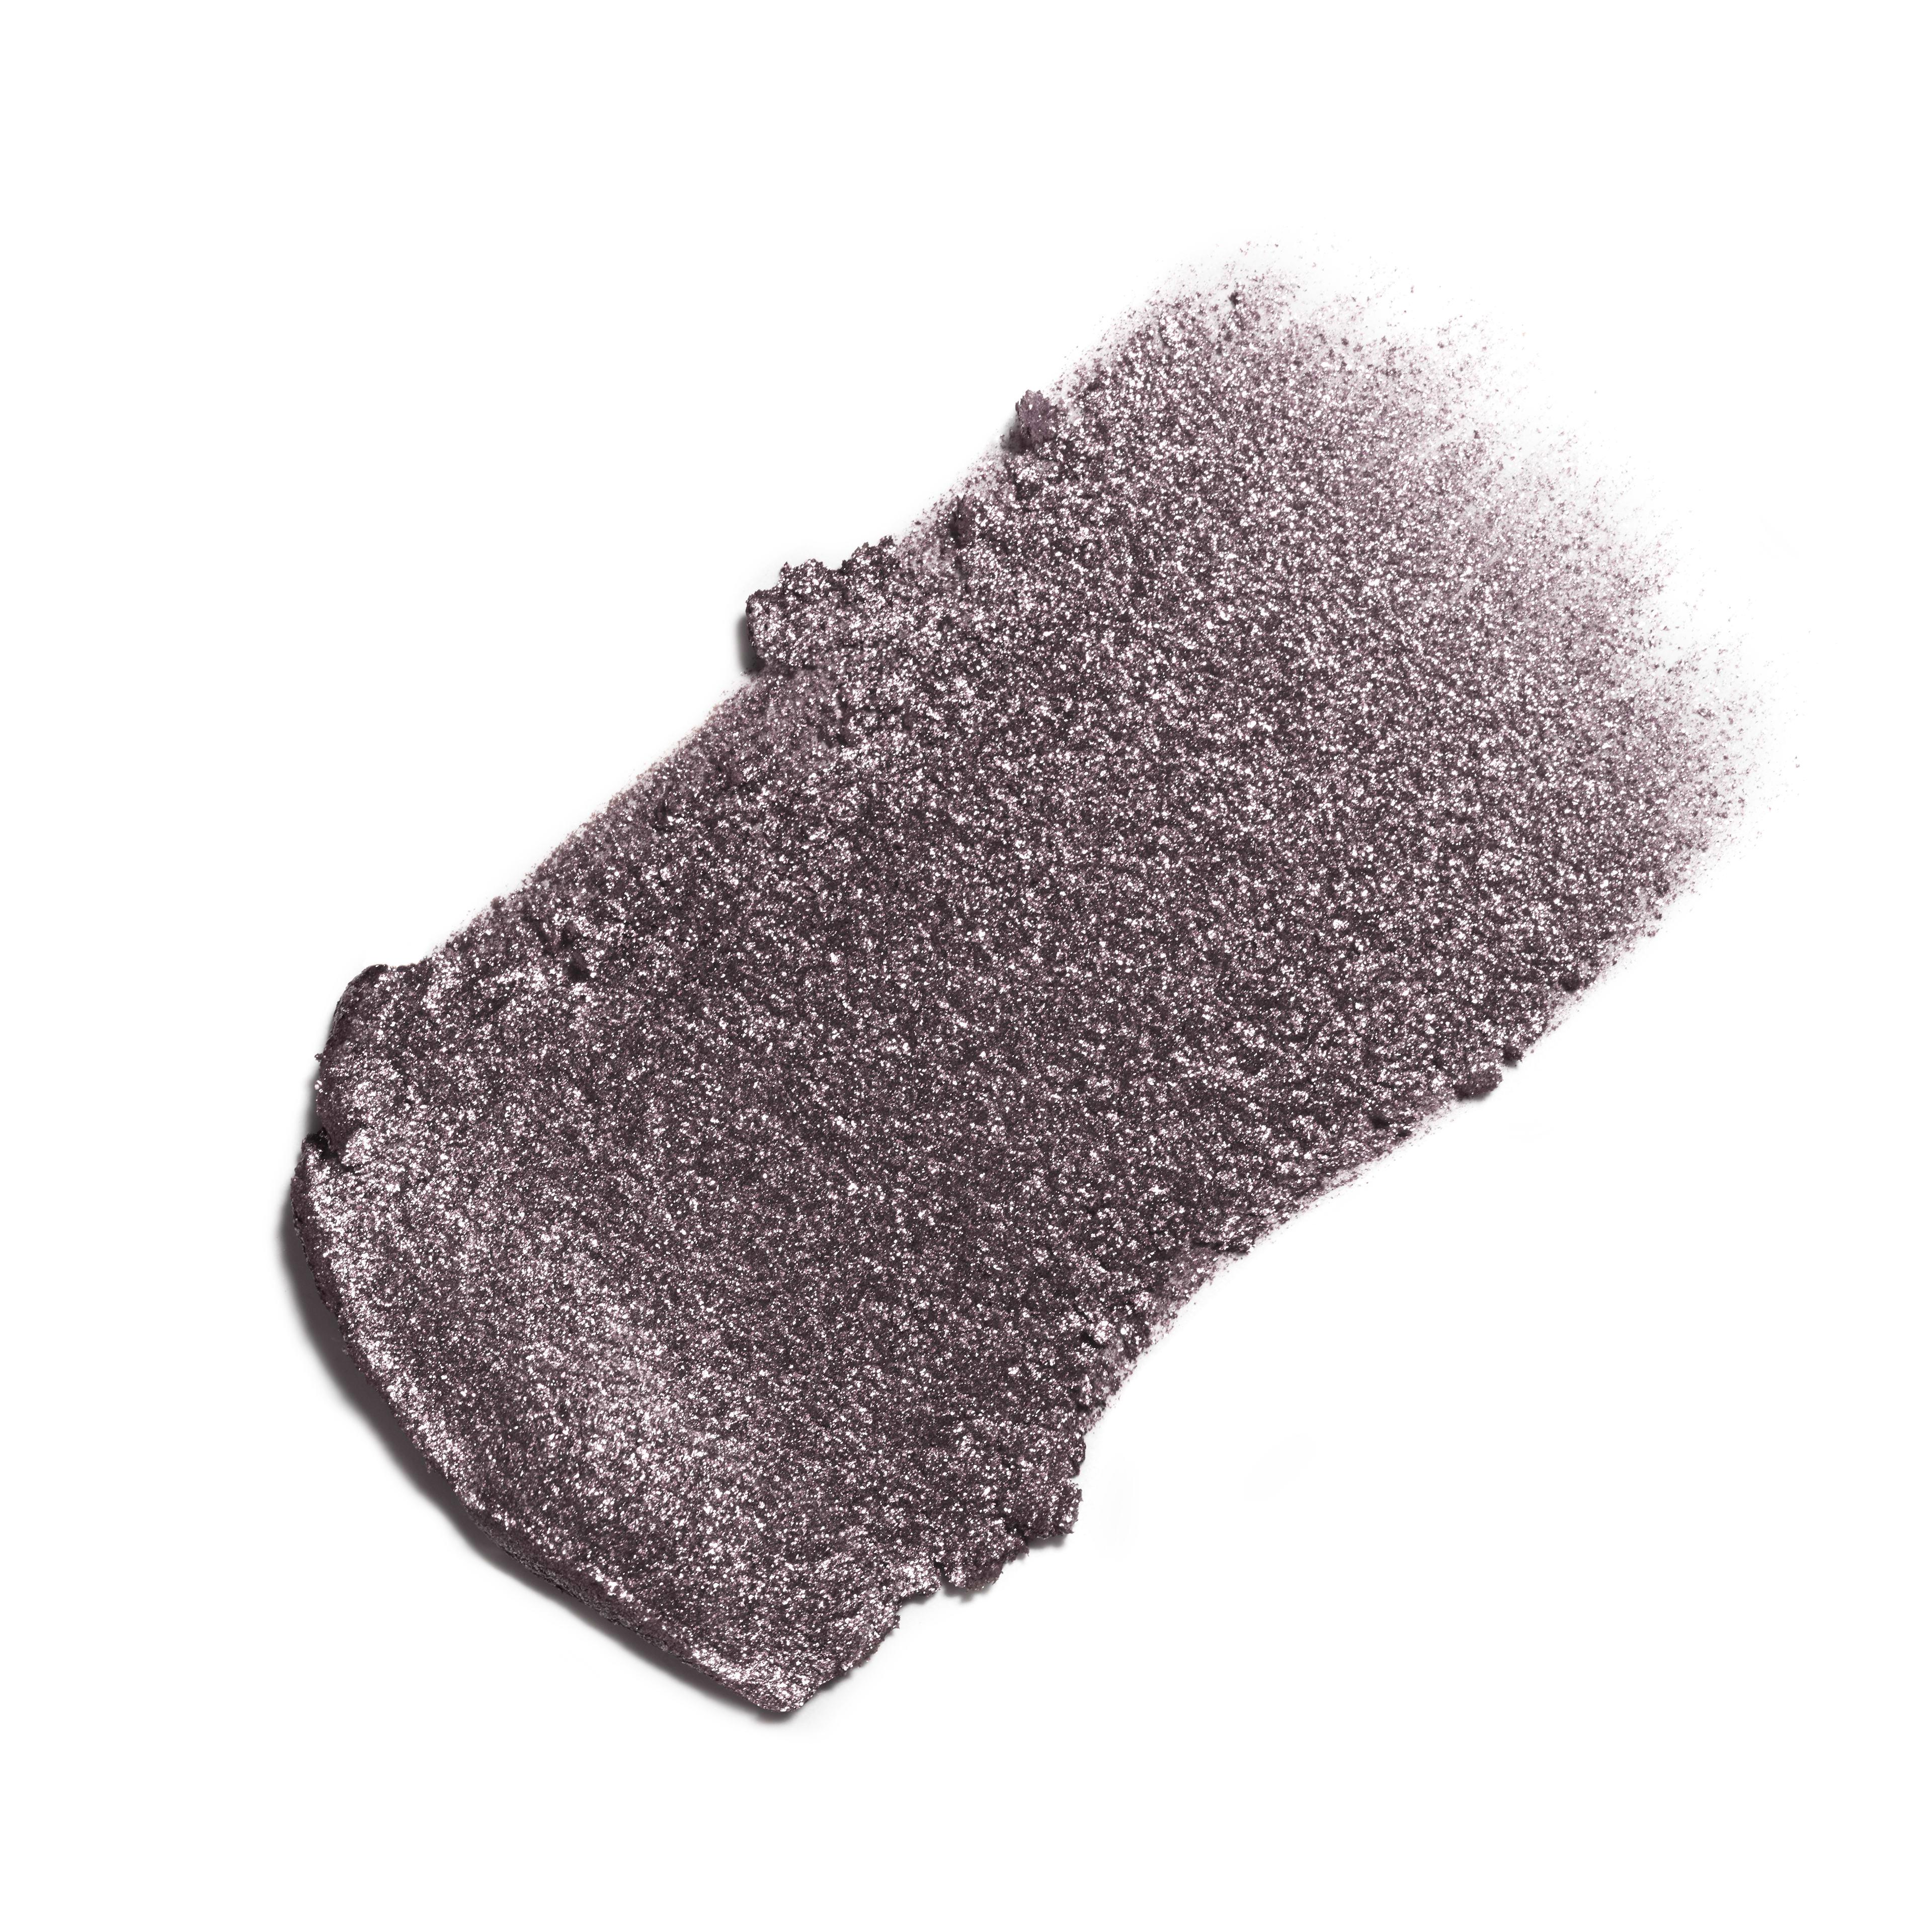 ILLUSION D'OMBRE - makeup - 4g - 基本質地視圖